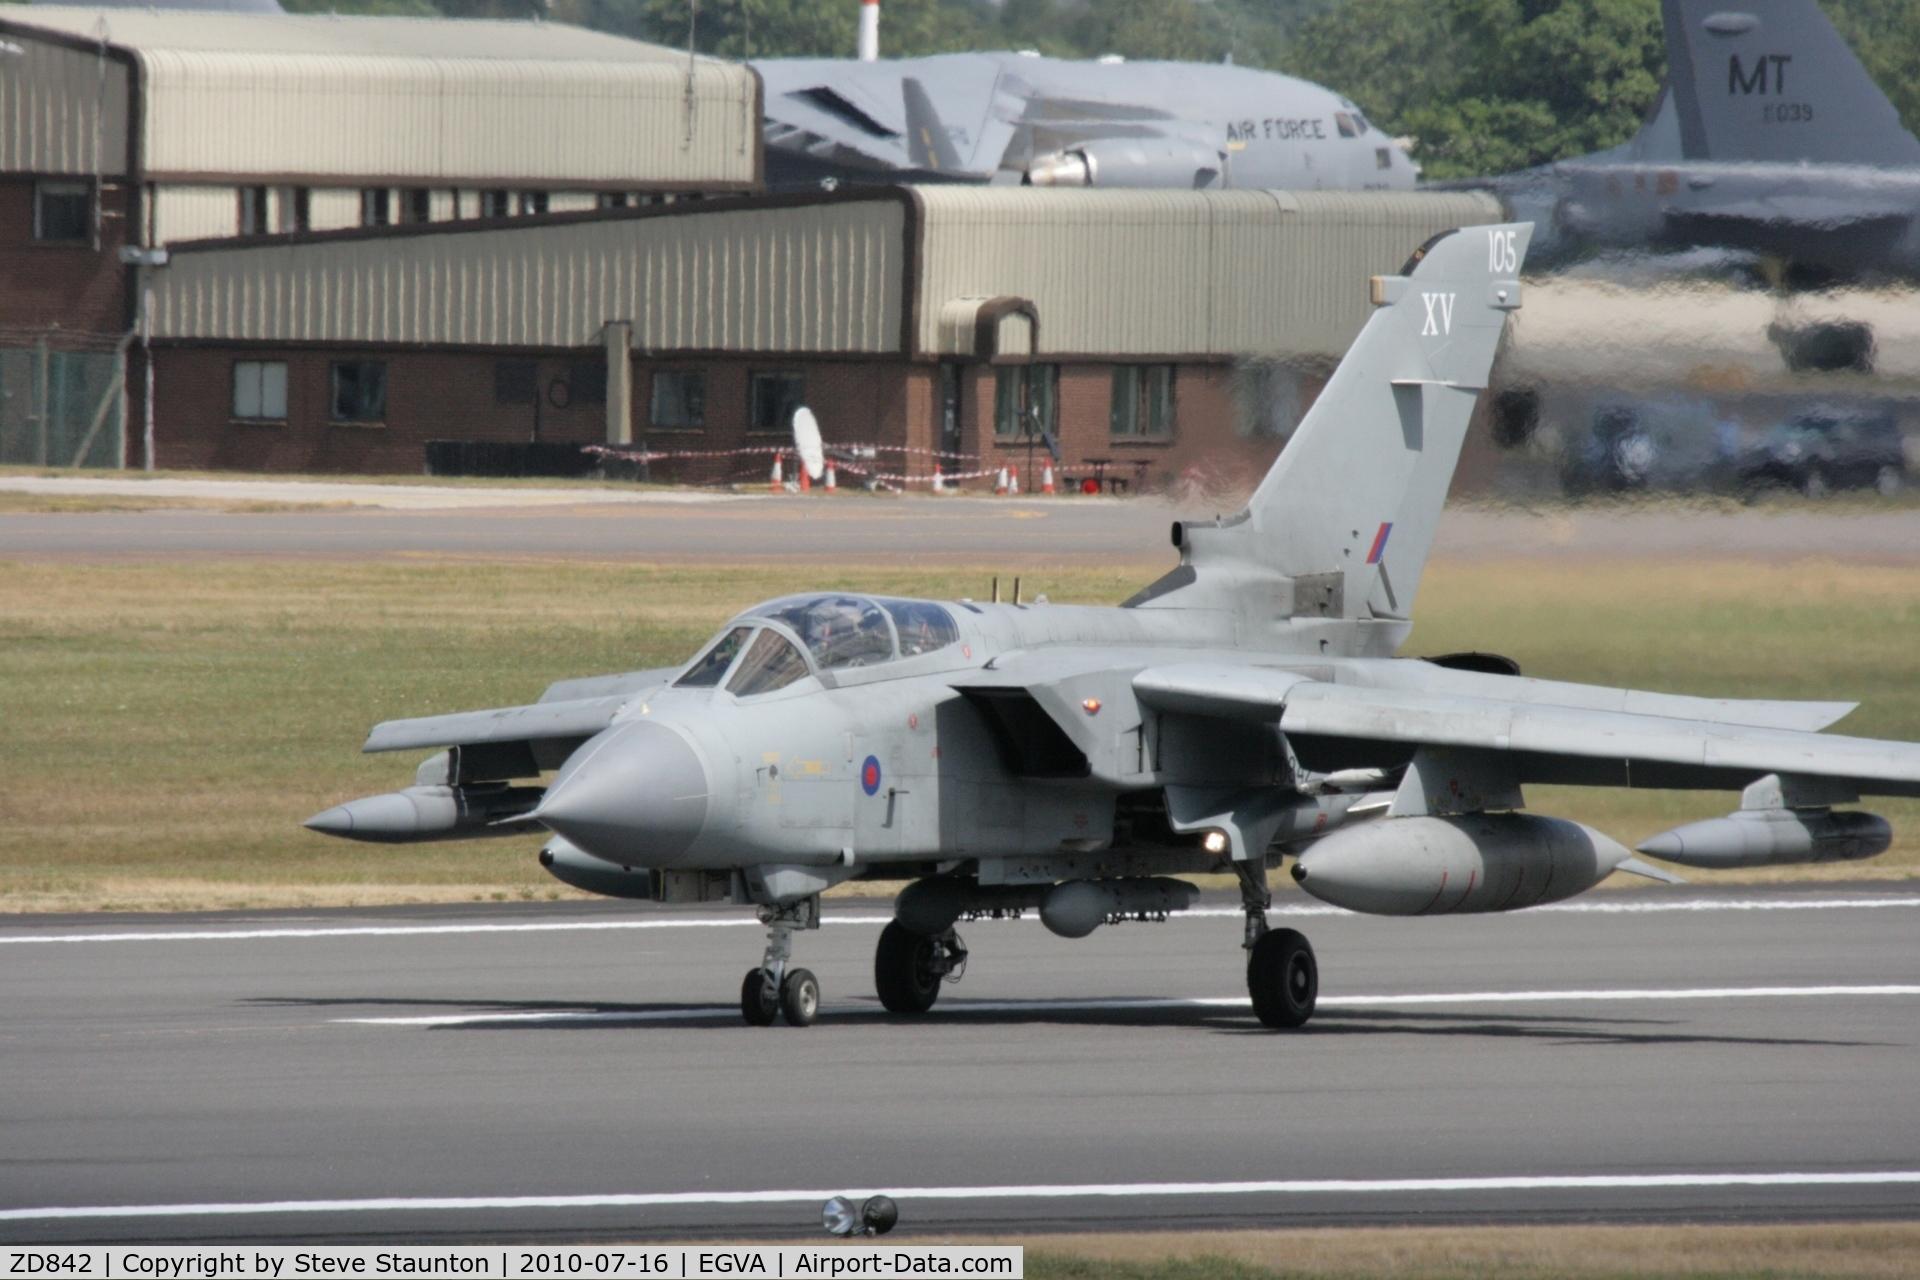 ZD842, 1985 Panavia Tornado GR.4 C/N 423/BT044/3193, Taken at the Royal International Air Tattoo 2010